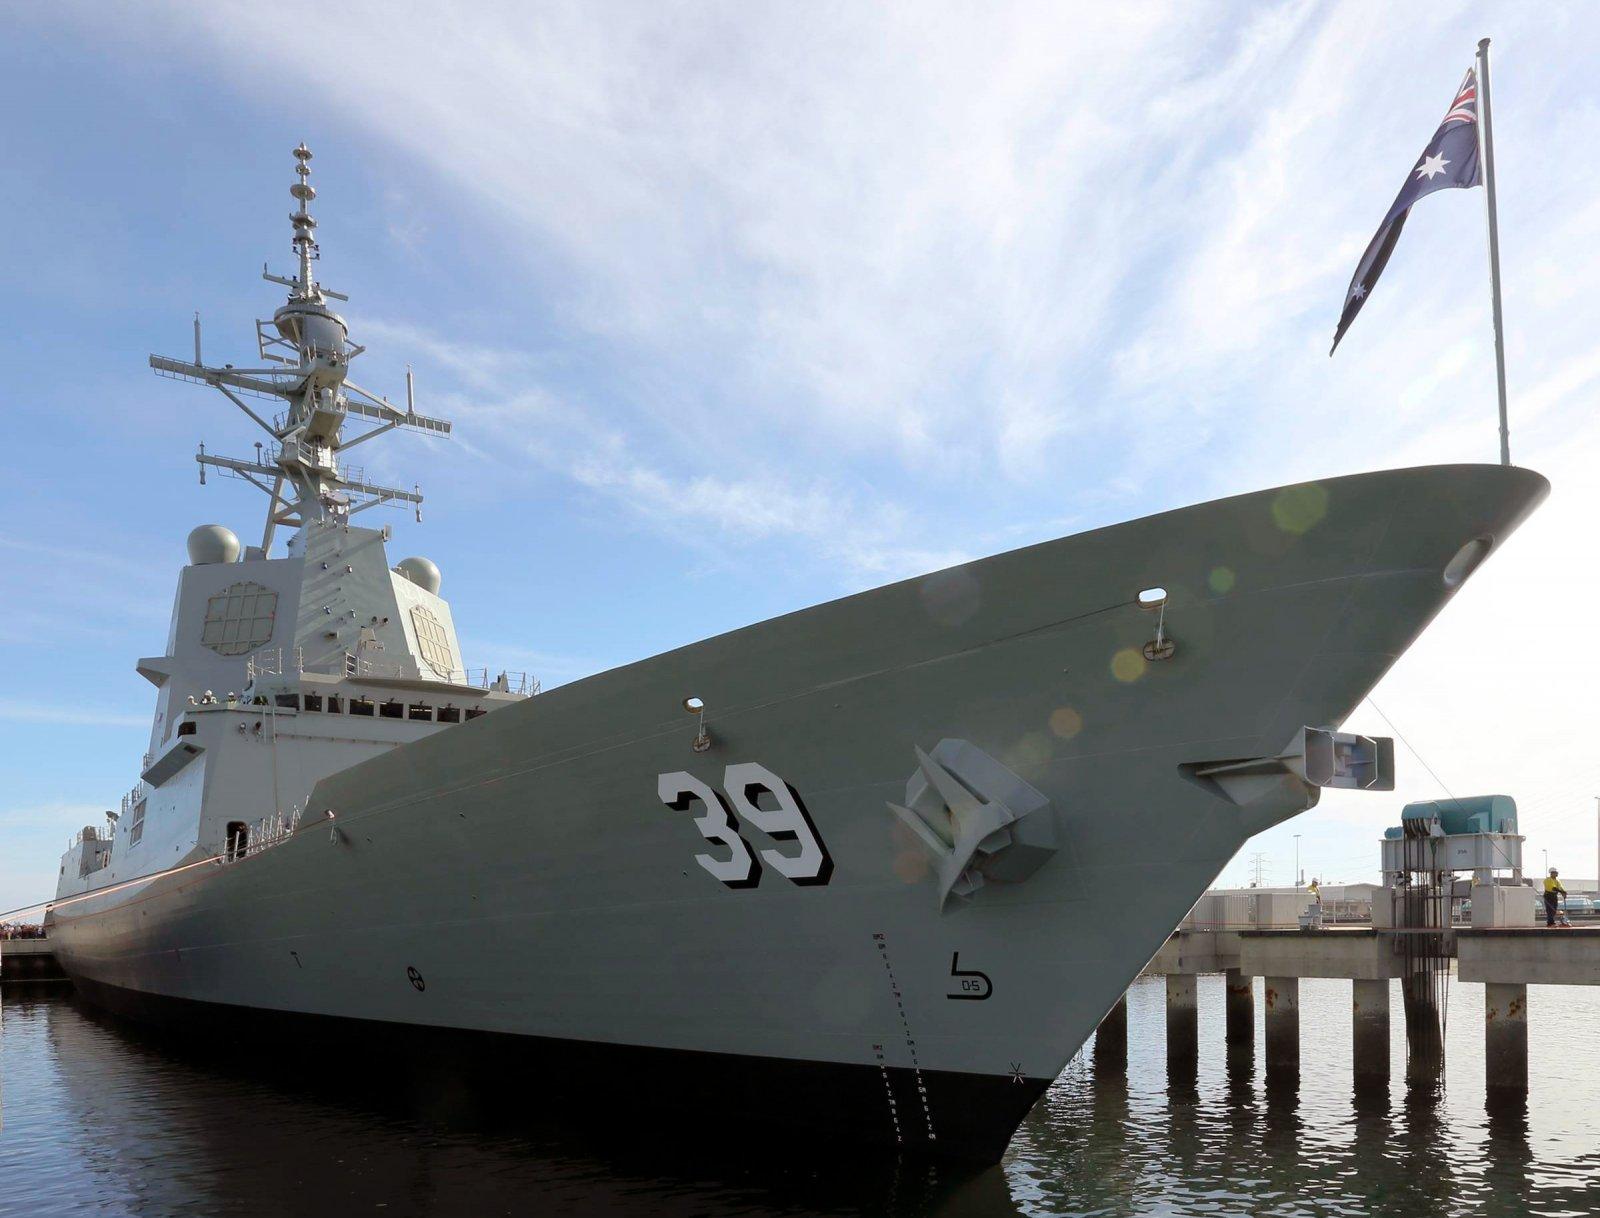 the Royal Australian Navy's new air-warfare destroyers